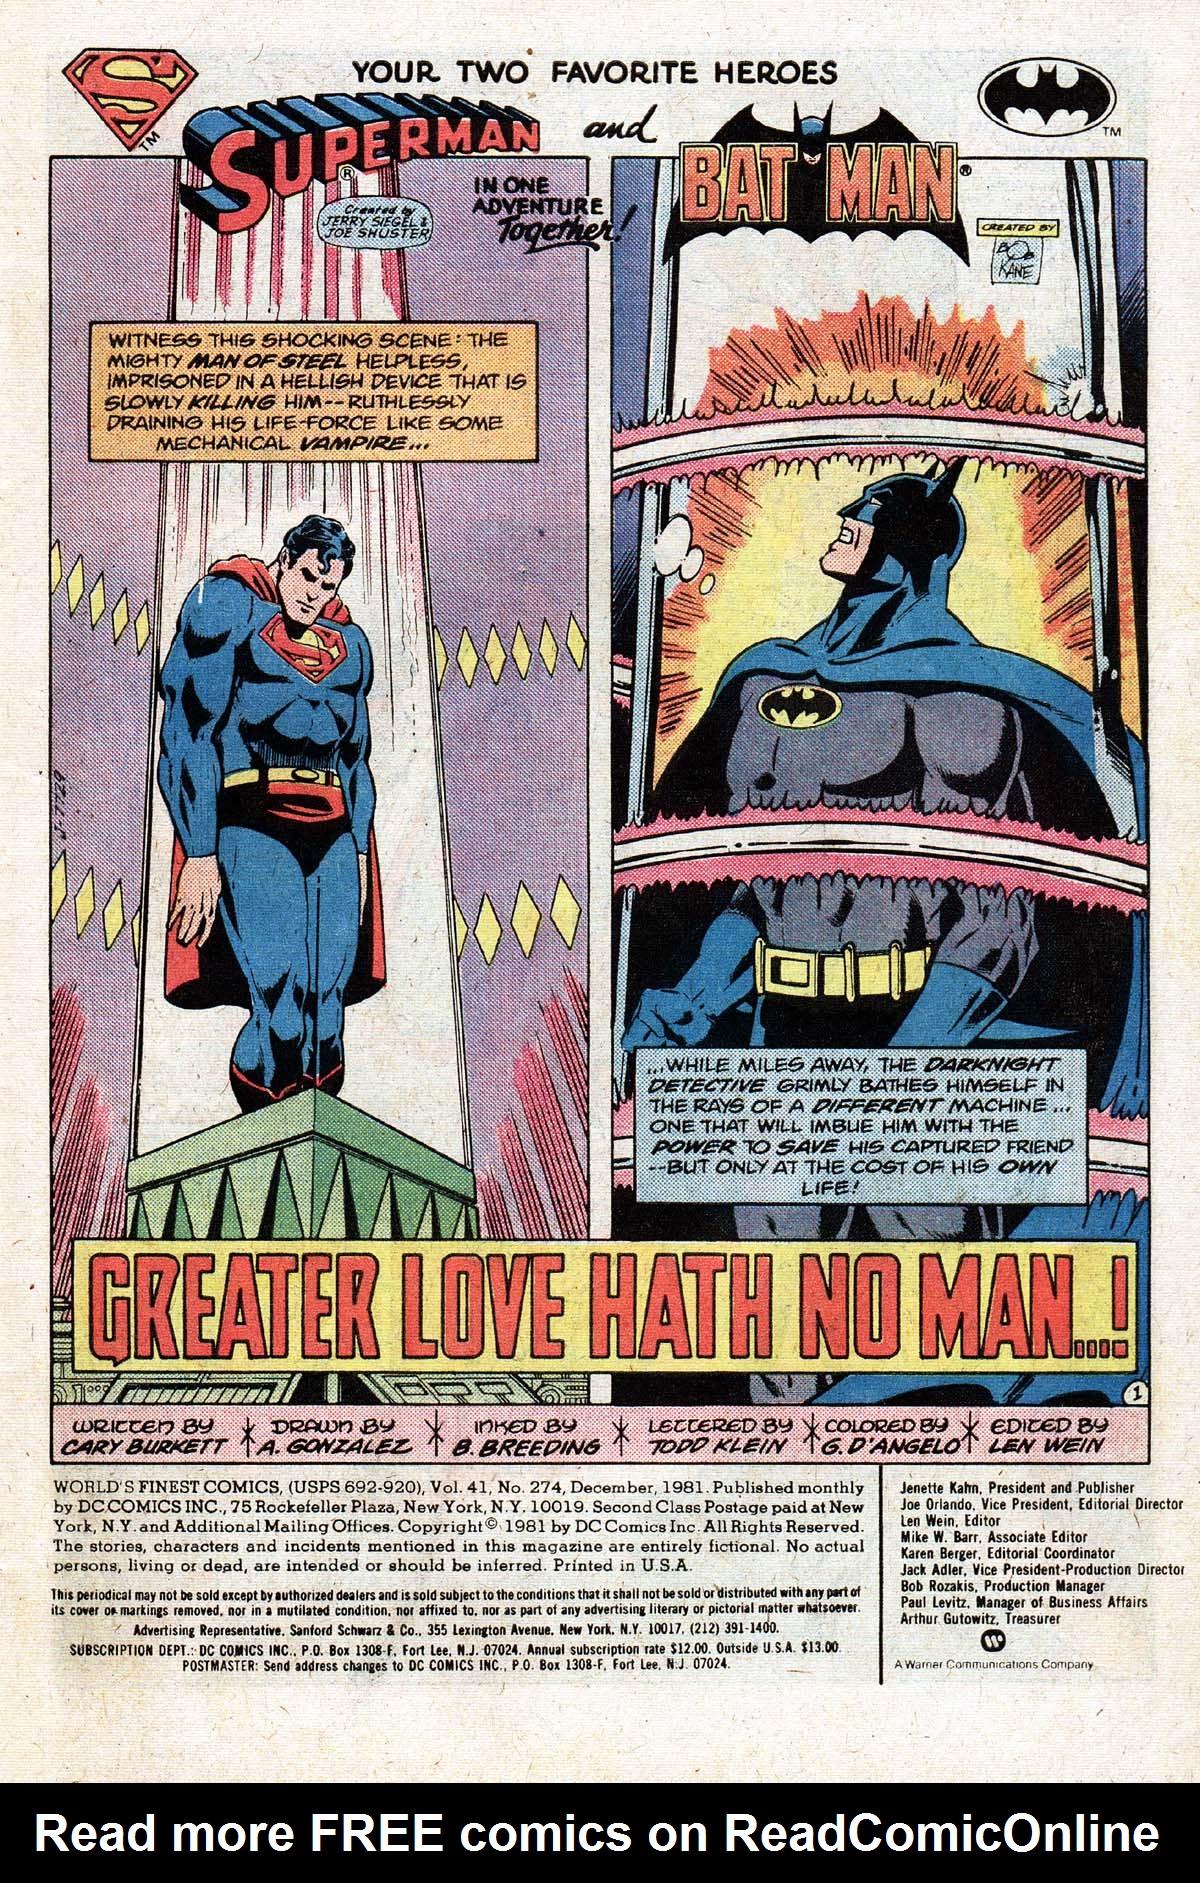 Read online World's Finest Comics comic -  Issue #274 - 3